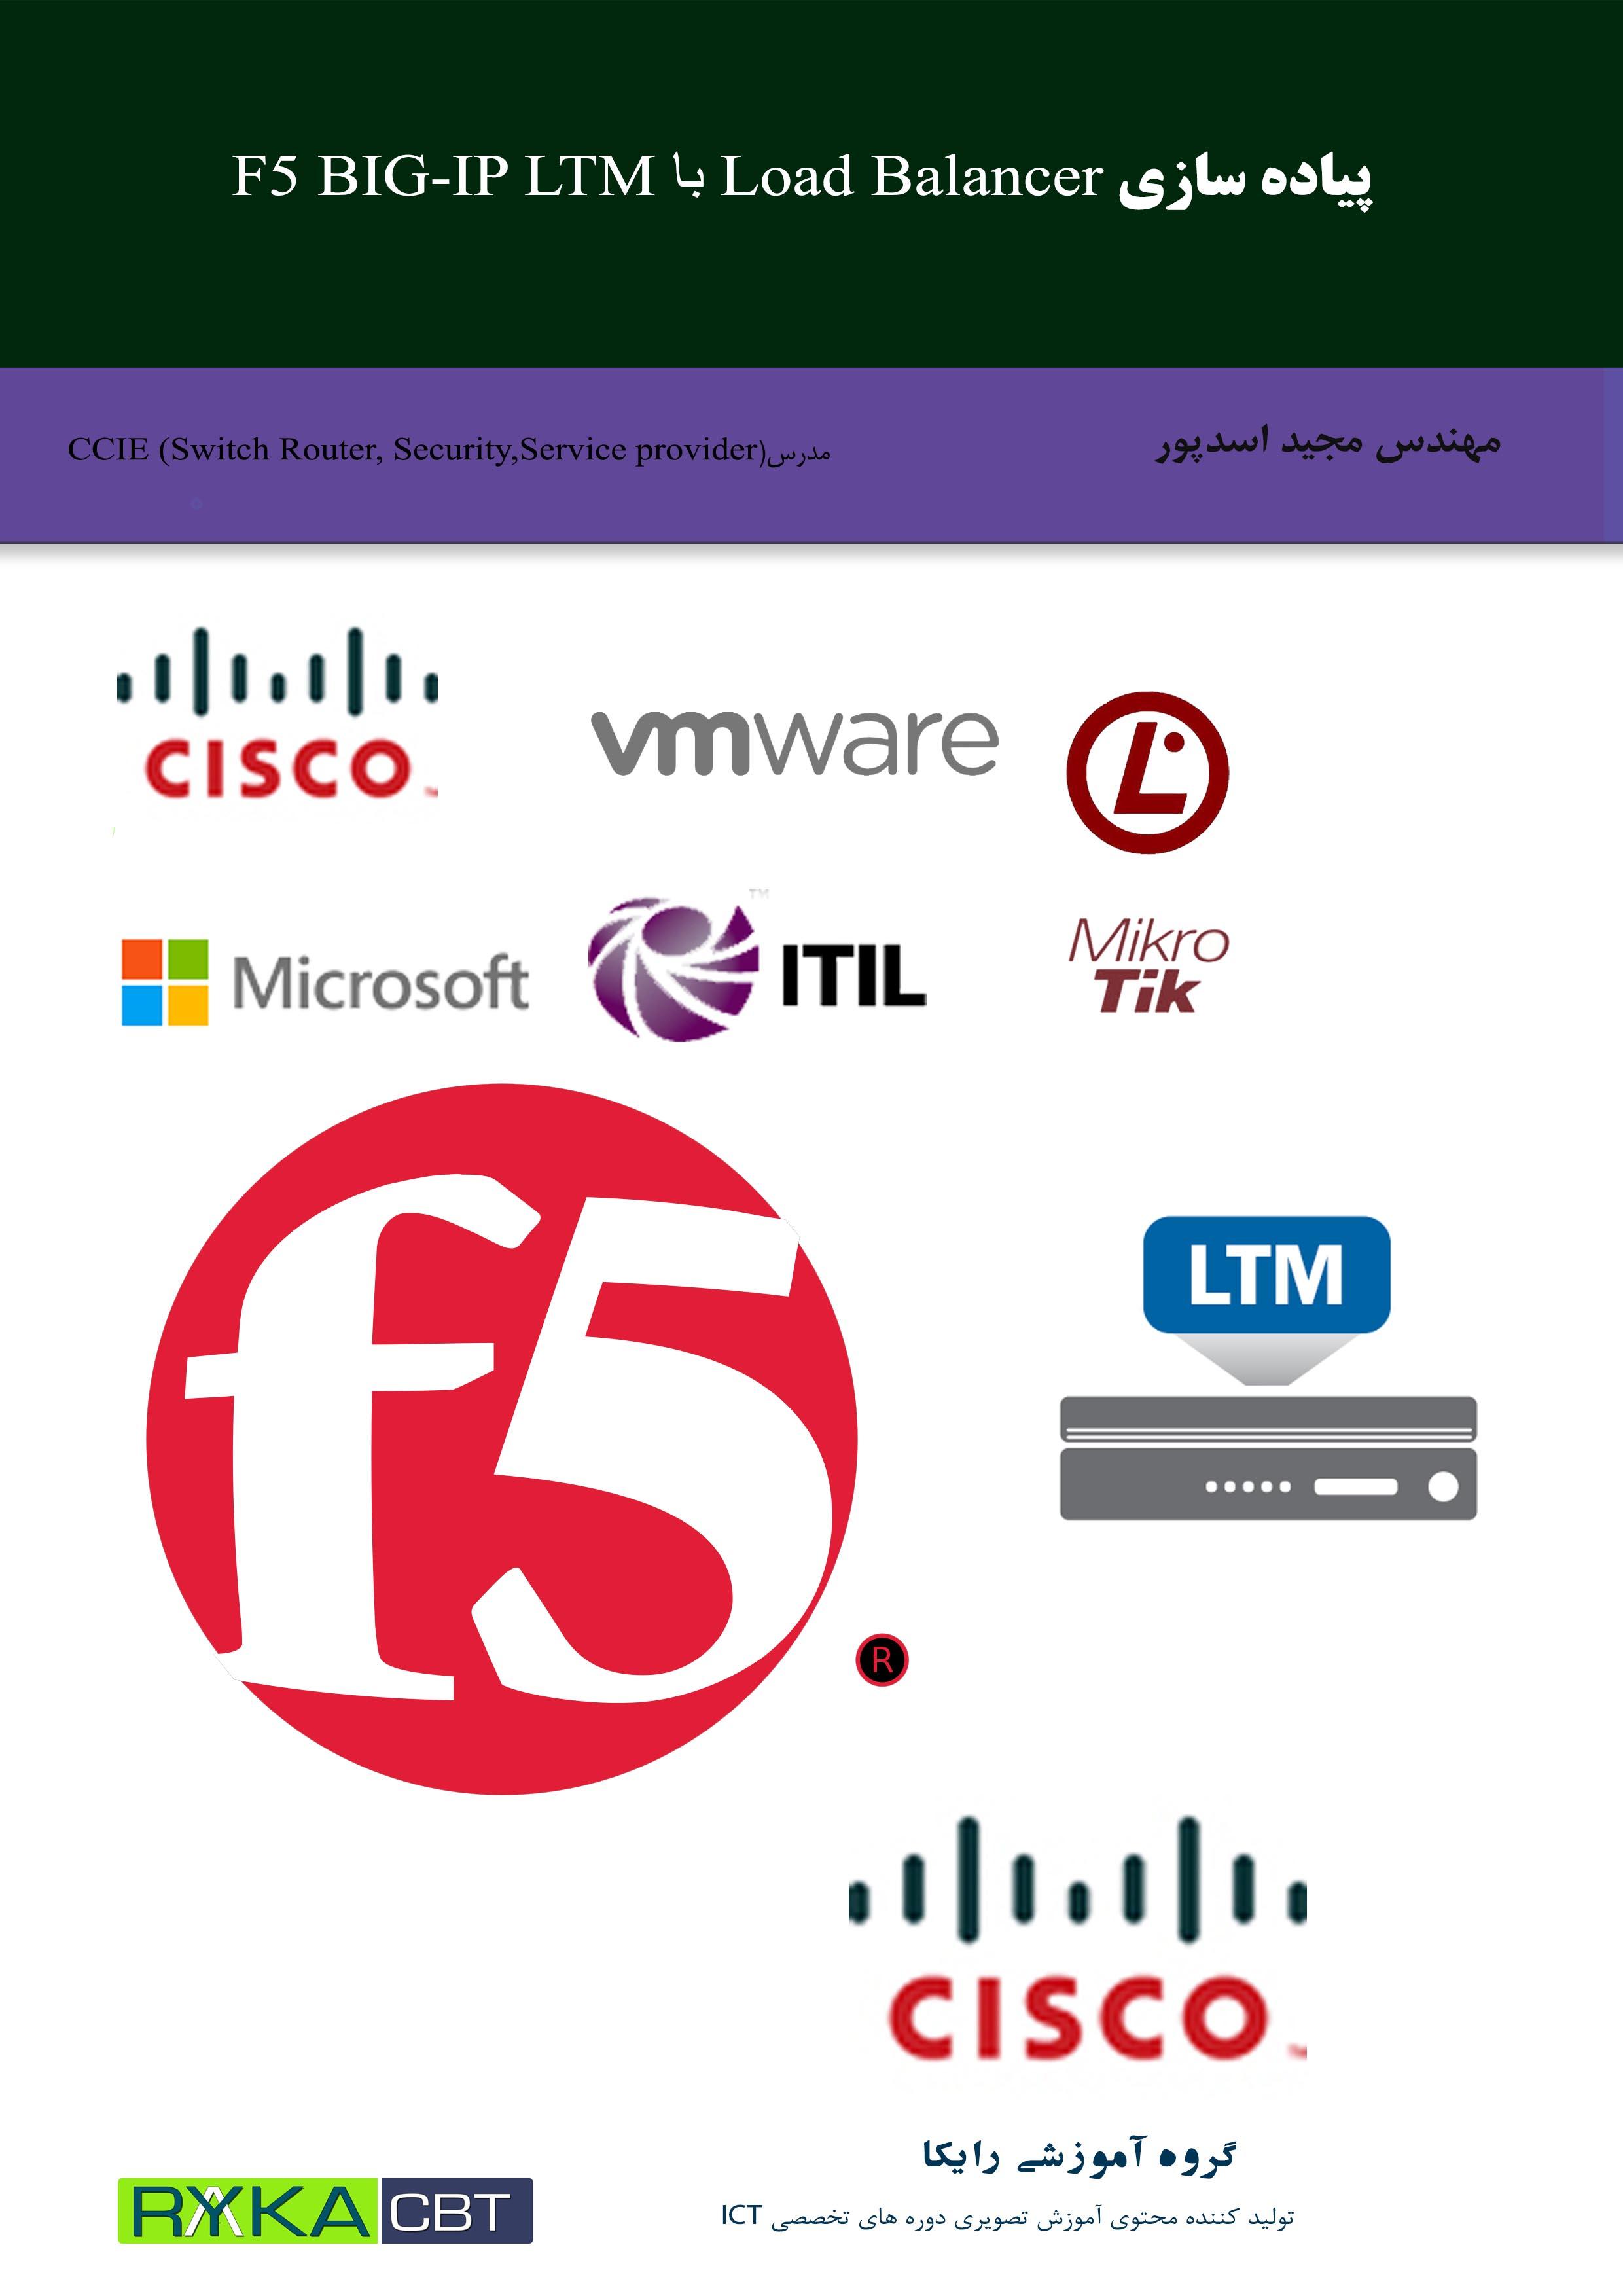 F5-CTS LTM Exam 301